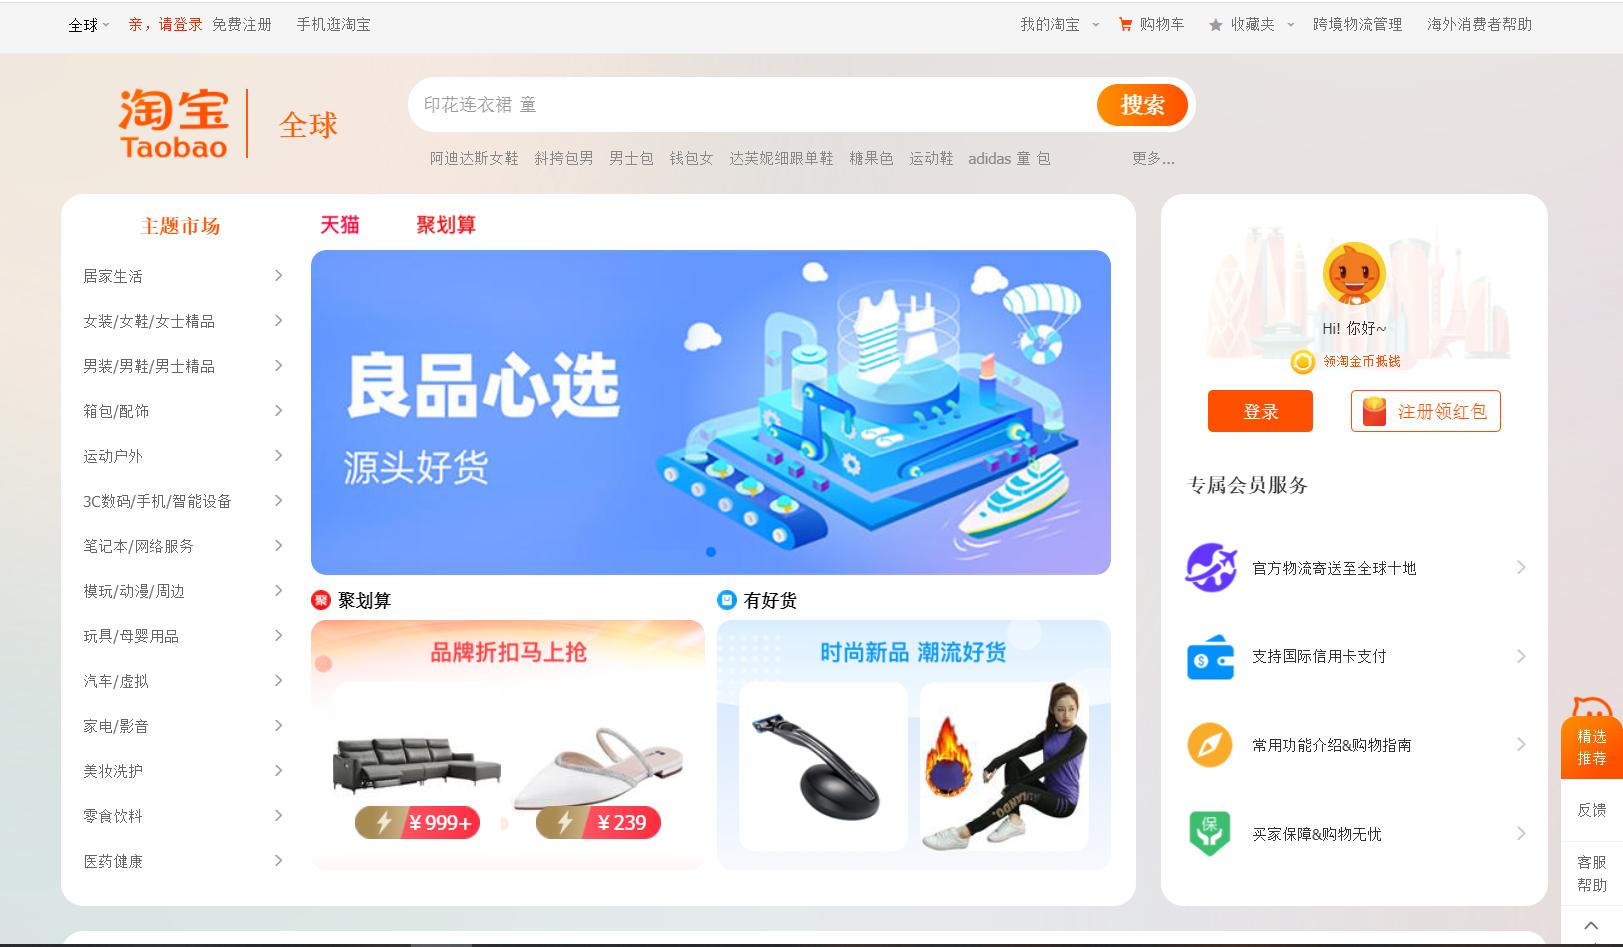 Cach-tim-nguon-hang-si-tren-Taobao-cho-nguoi-moi